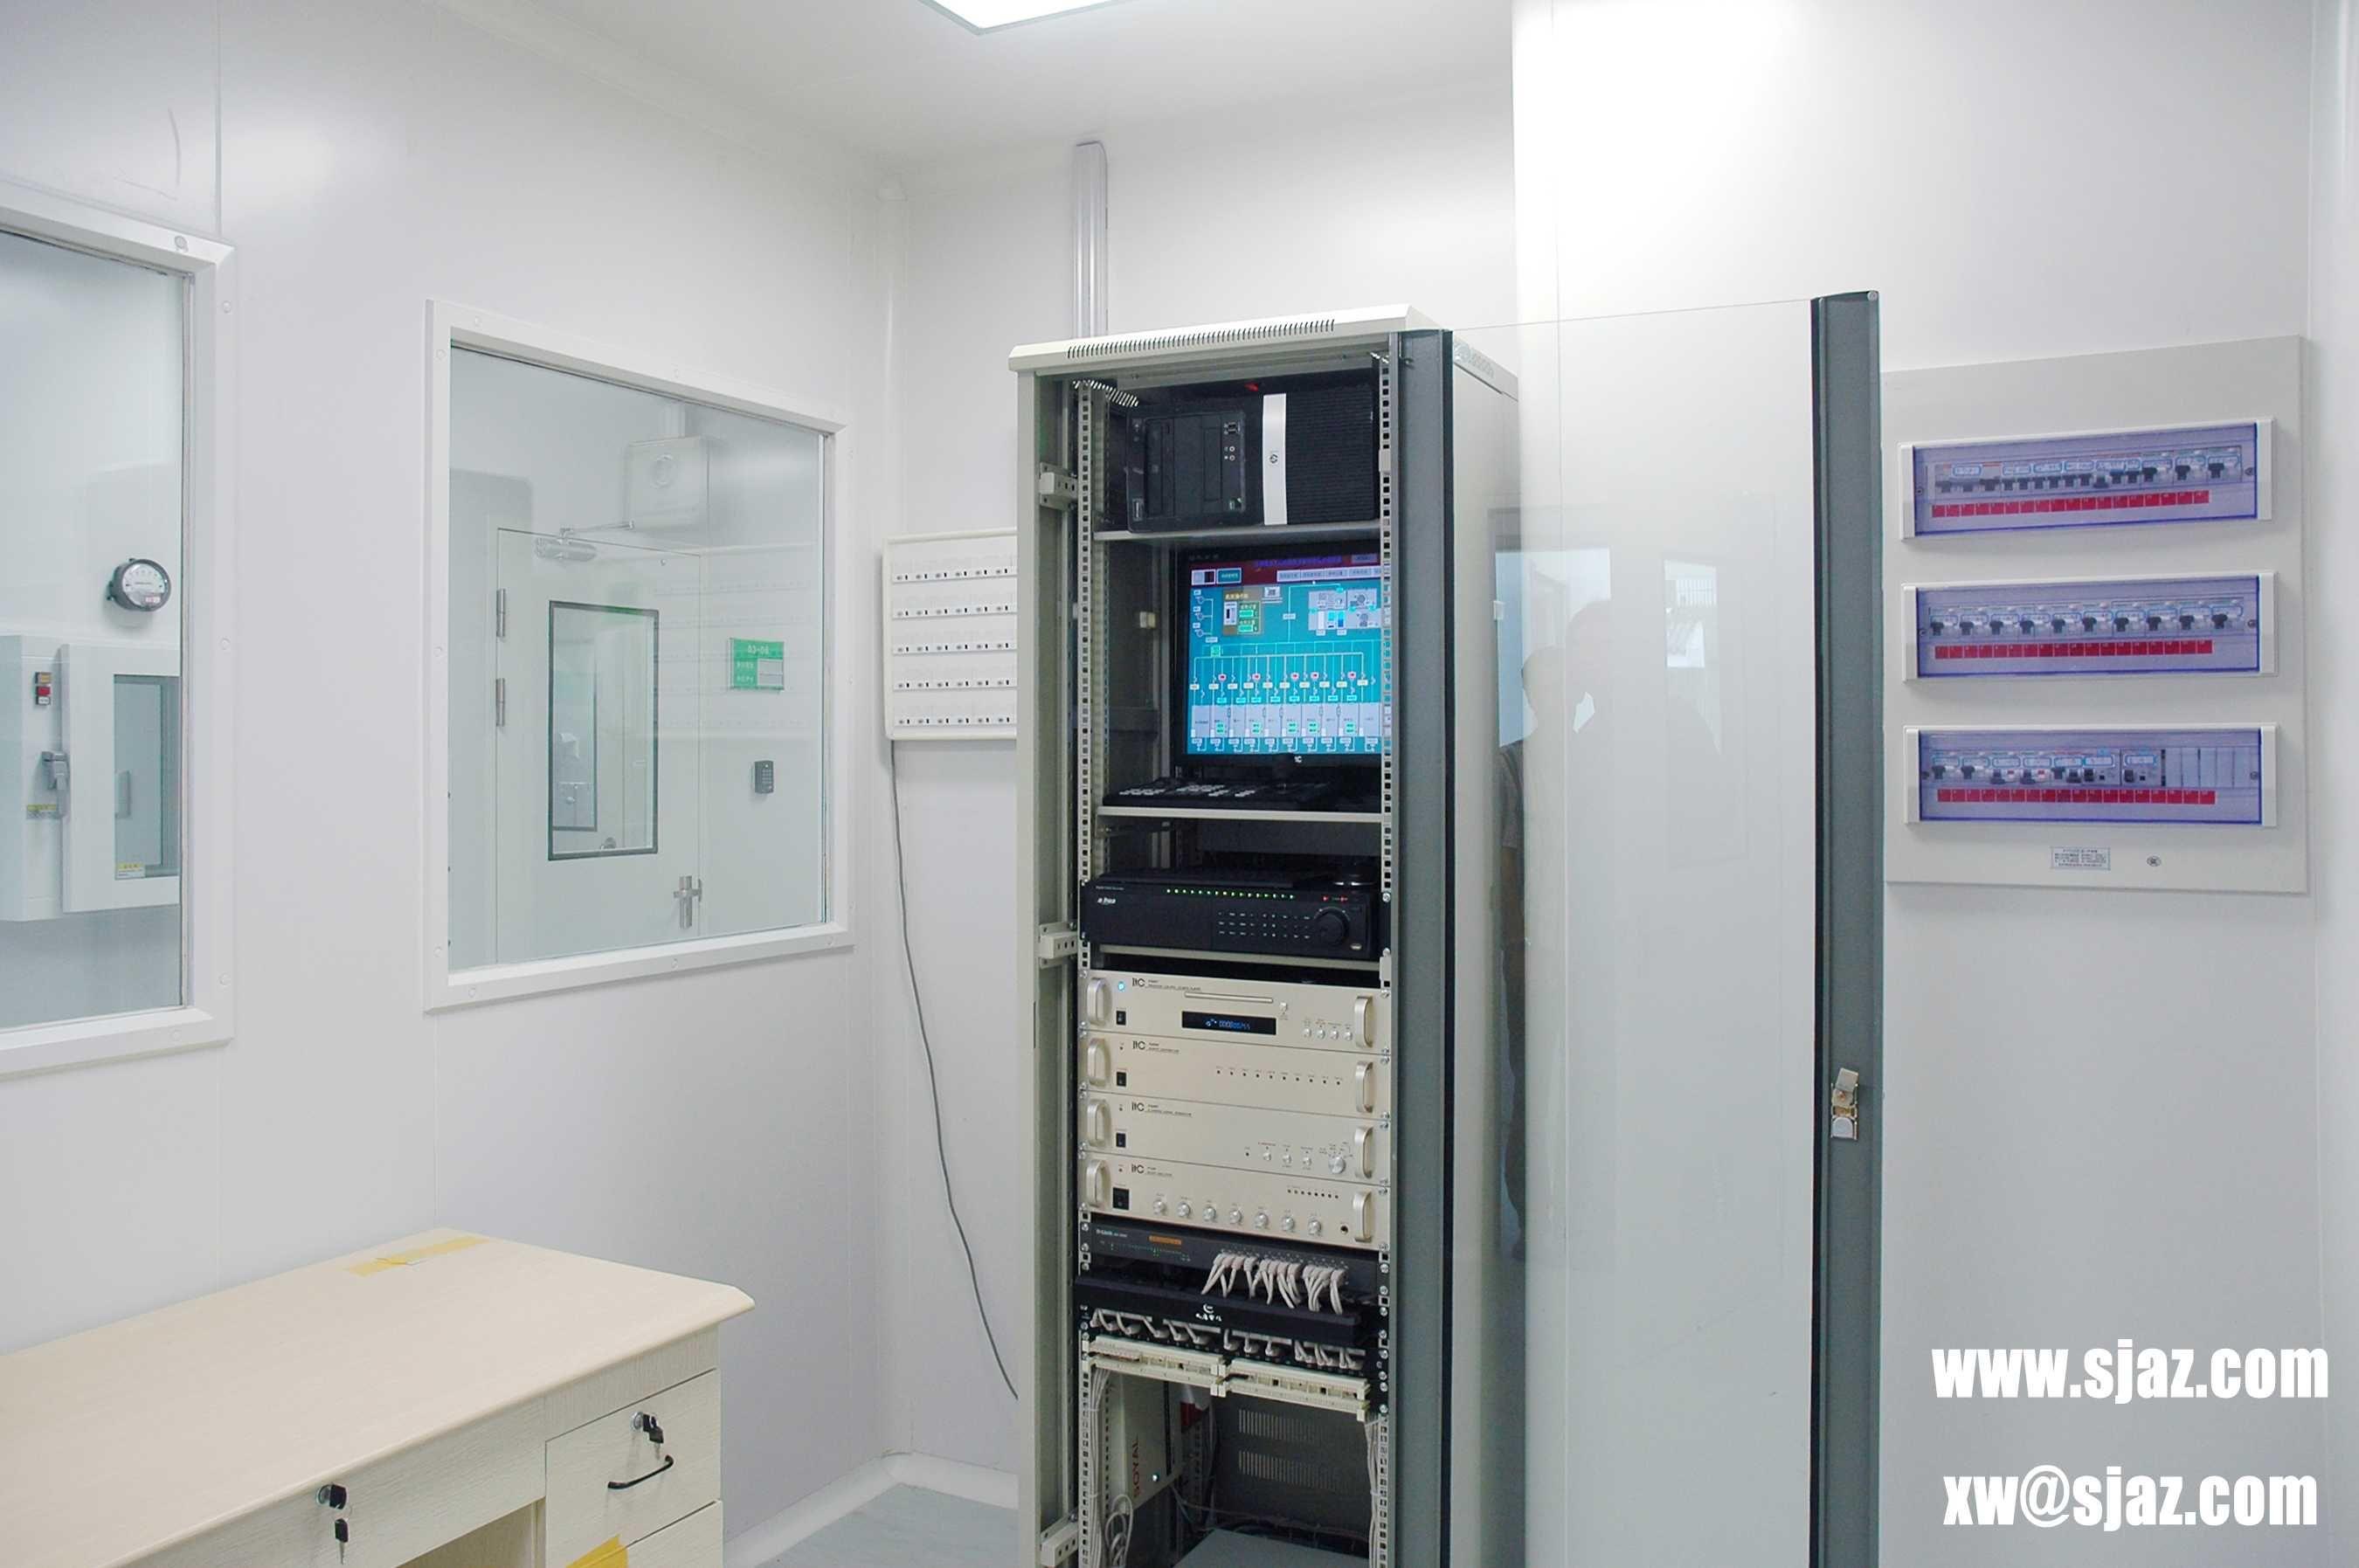 Cleanroom Application in HospitalNegative Pressure